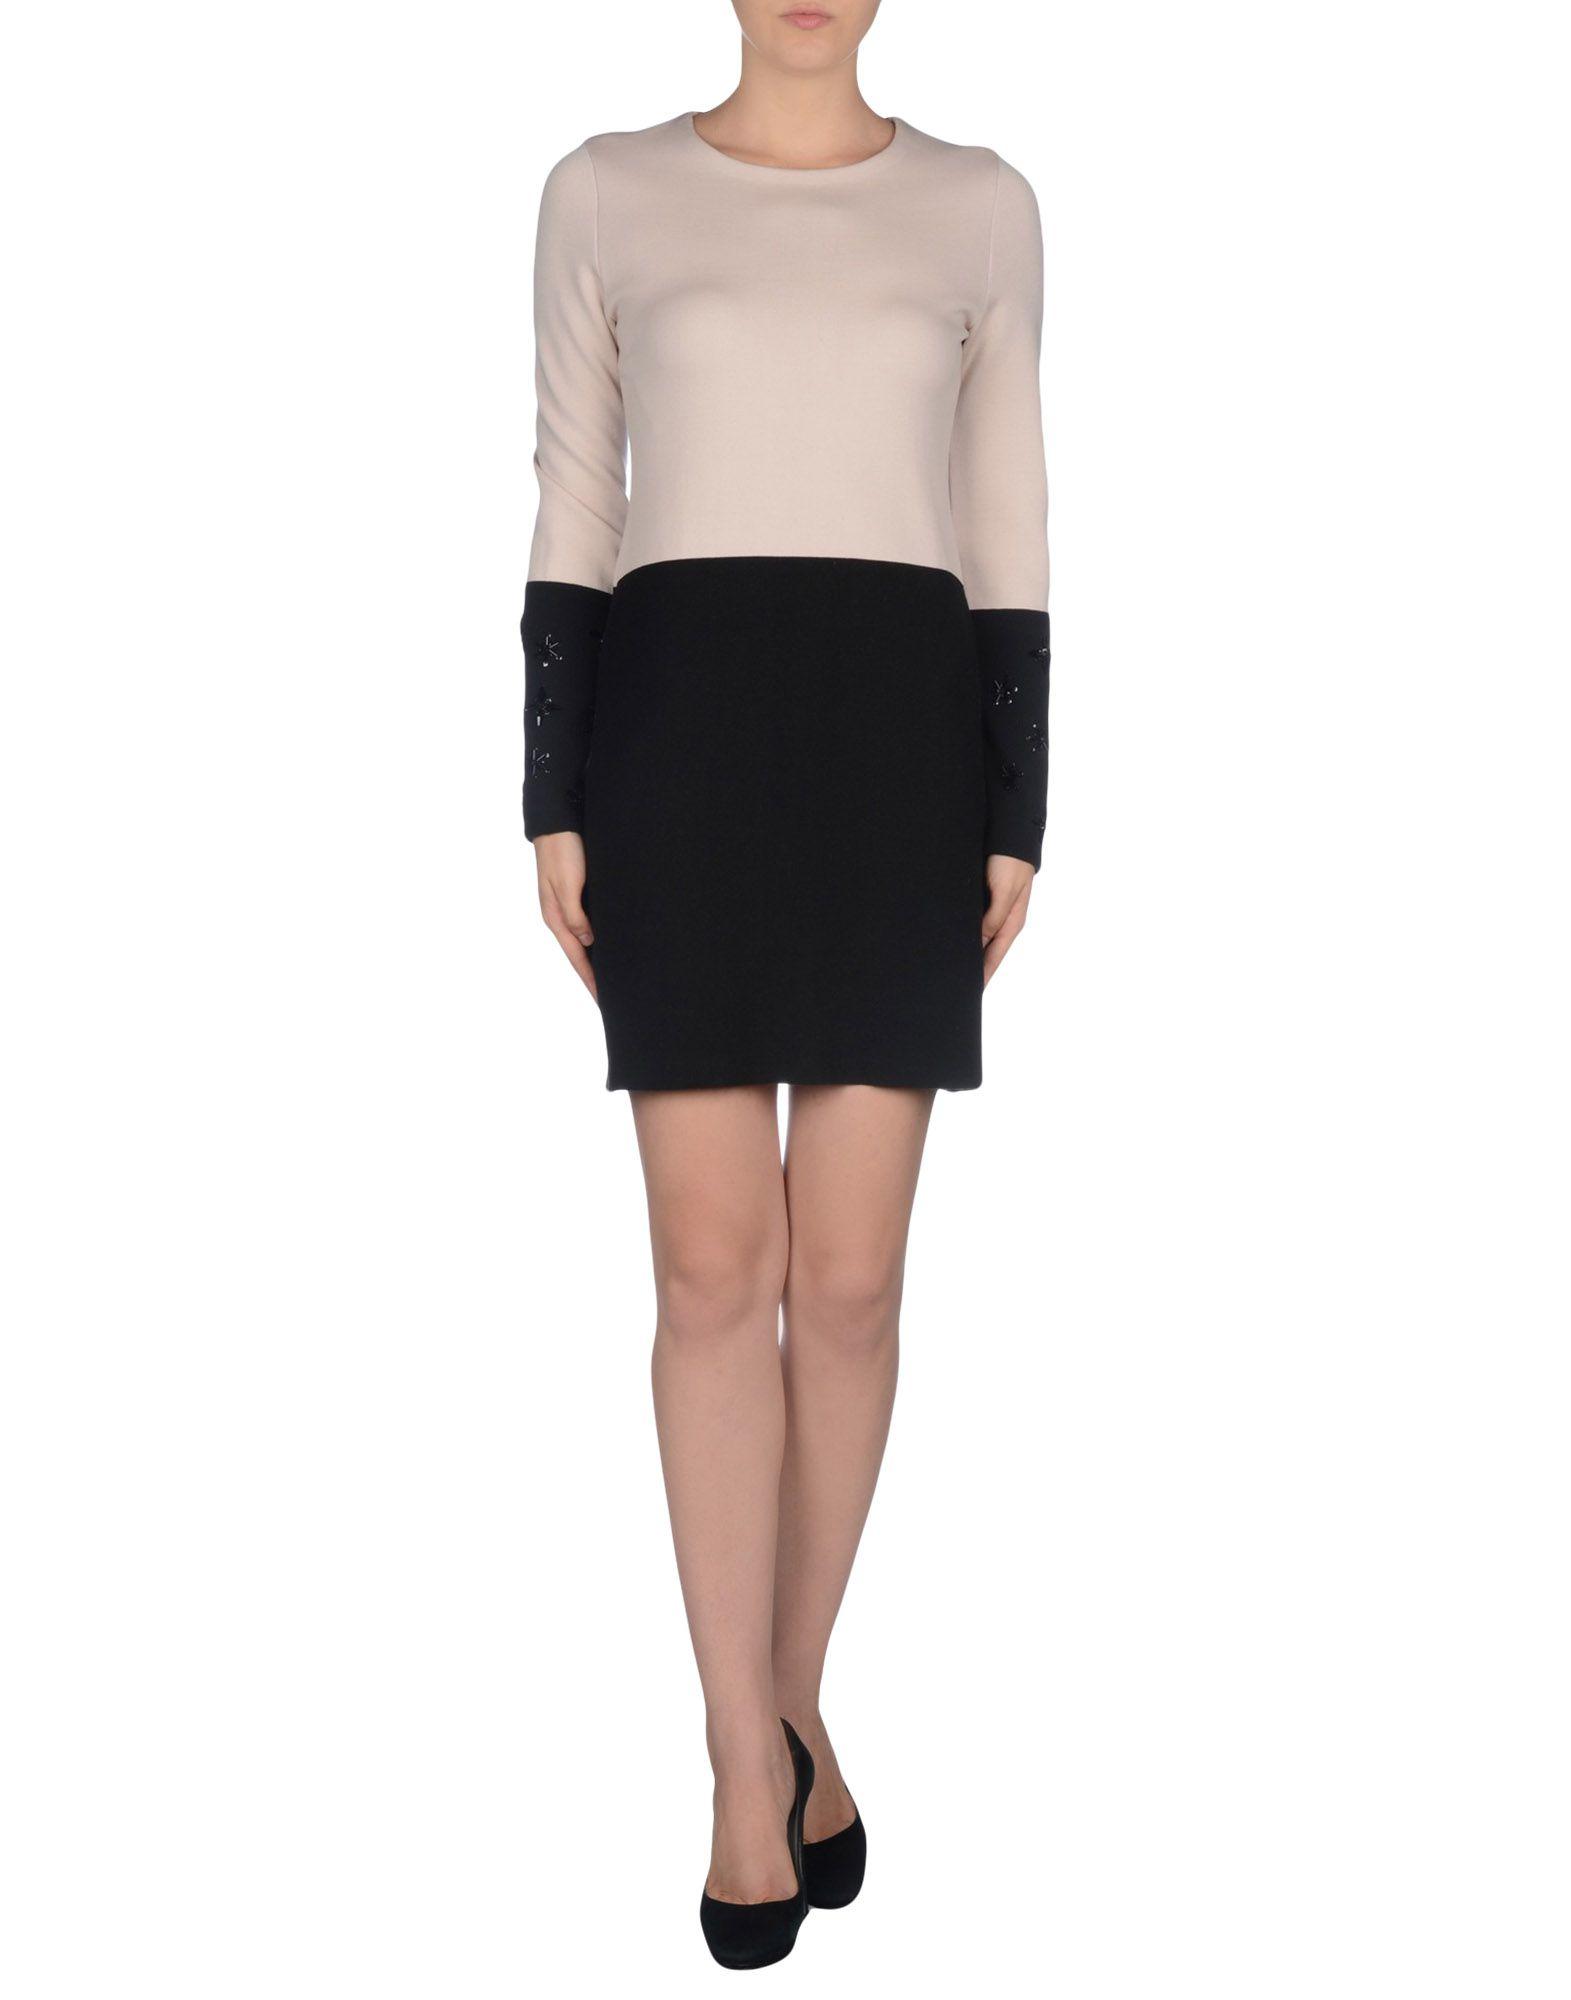 dior short dresses - photo #22